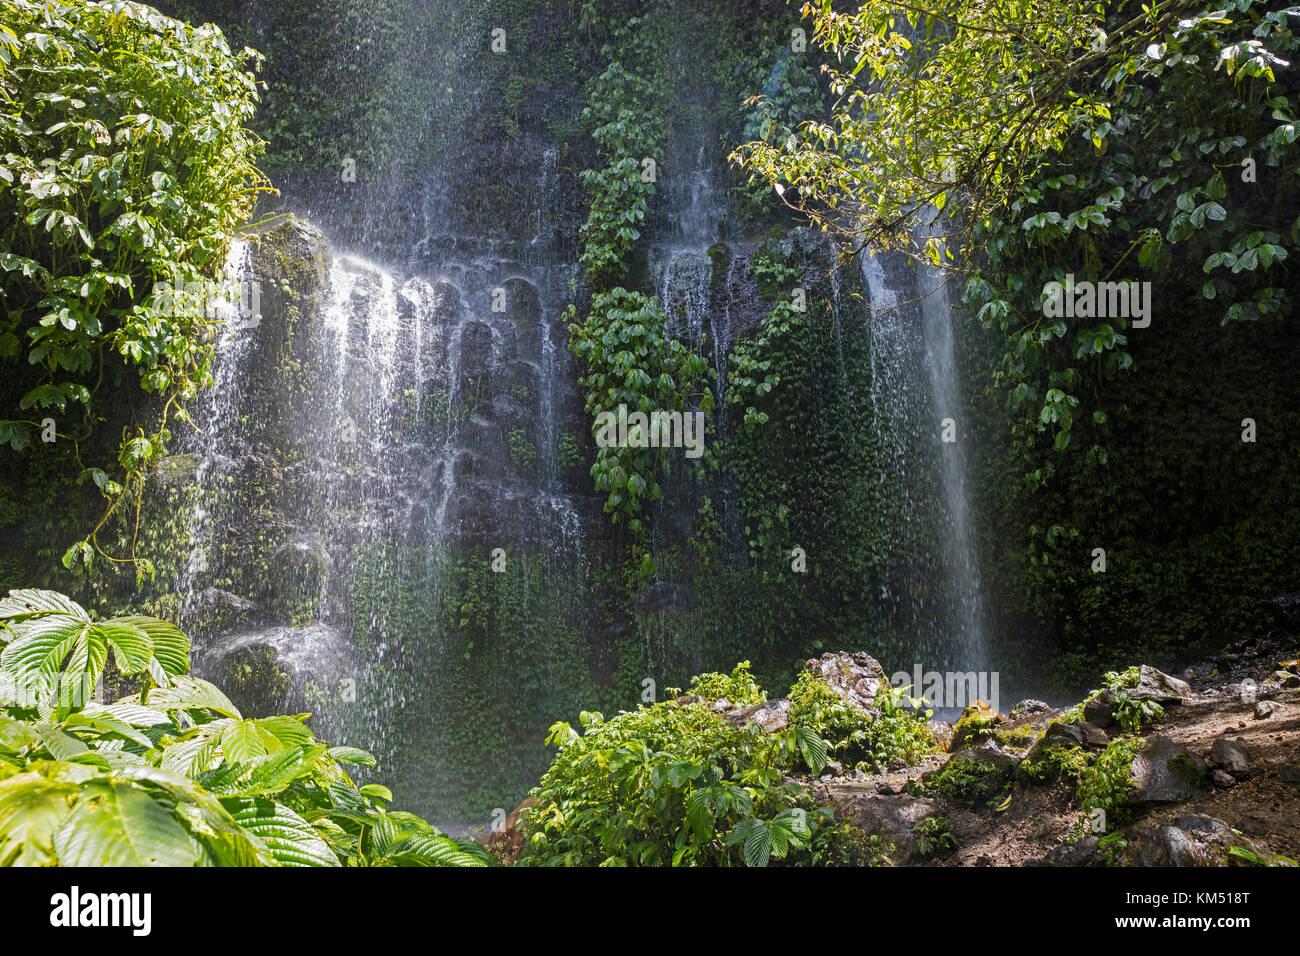 Benang Kelambu Waterfall in tropical forest near the village Aik Berik, North Batukliang, Central Lombok, Indonesia - Stock Image